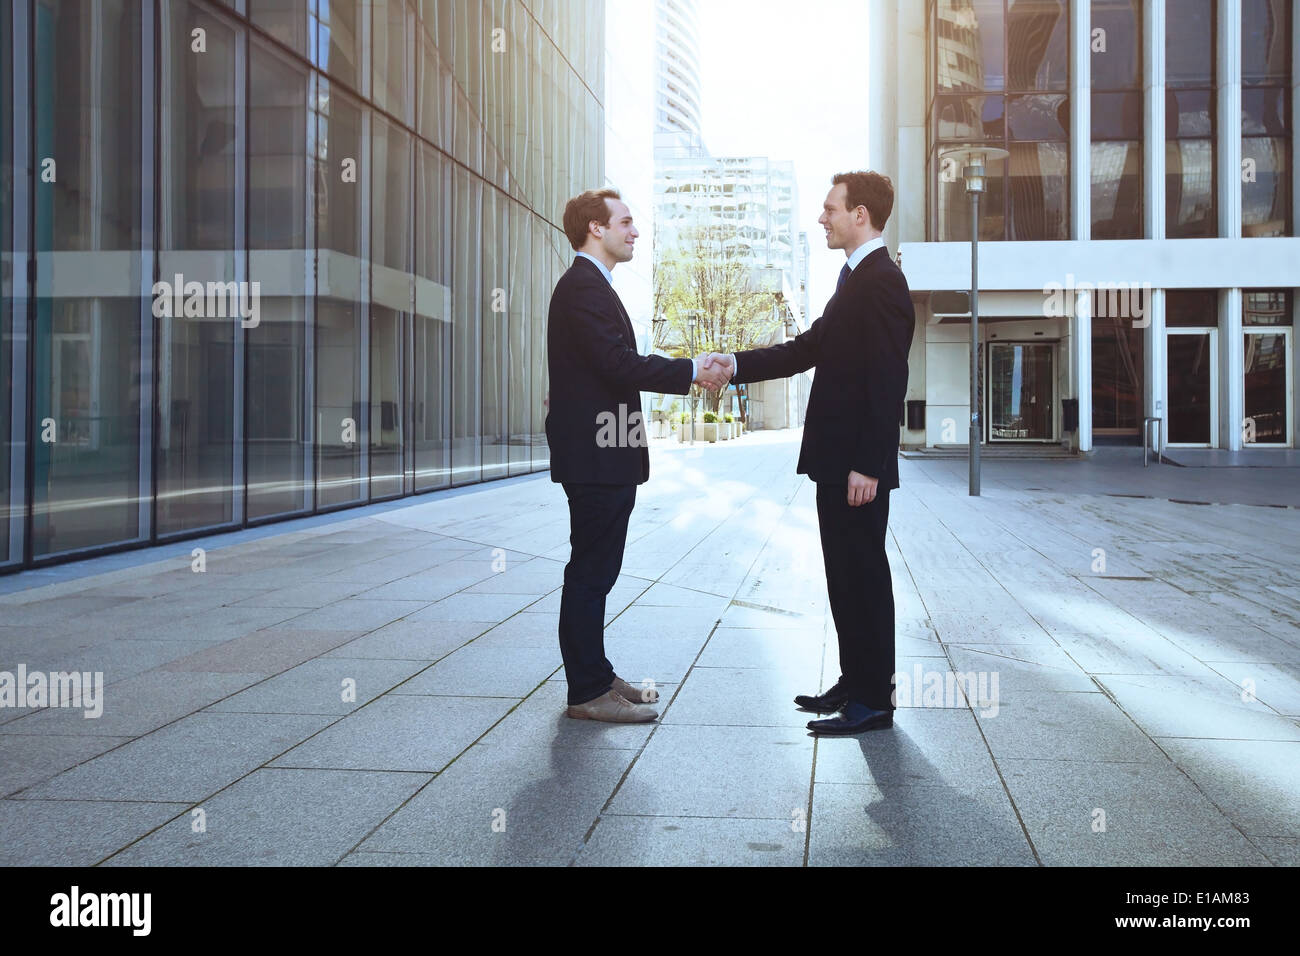 Dos hombres de negocios, un apretón de manos Imagen De Stock